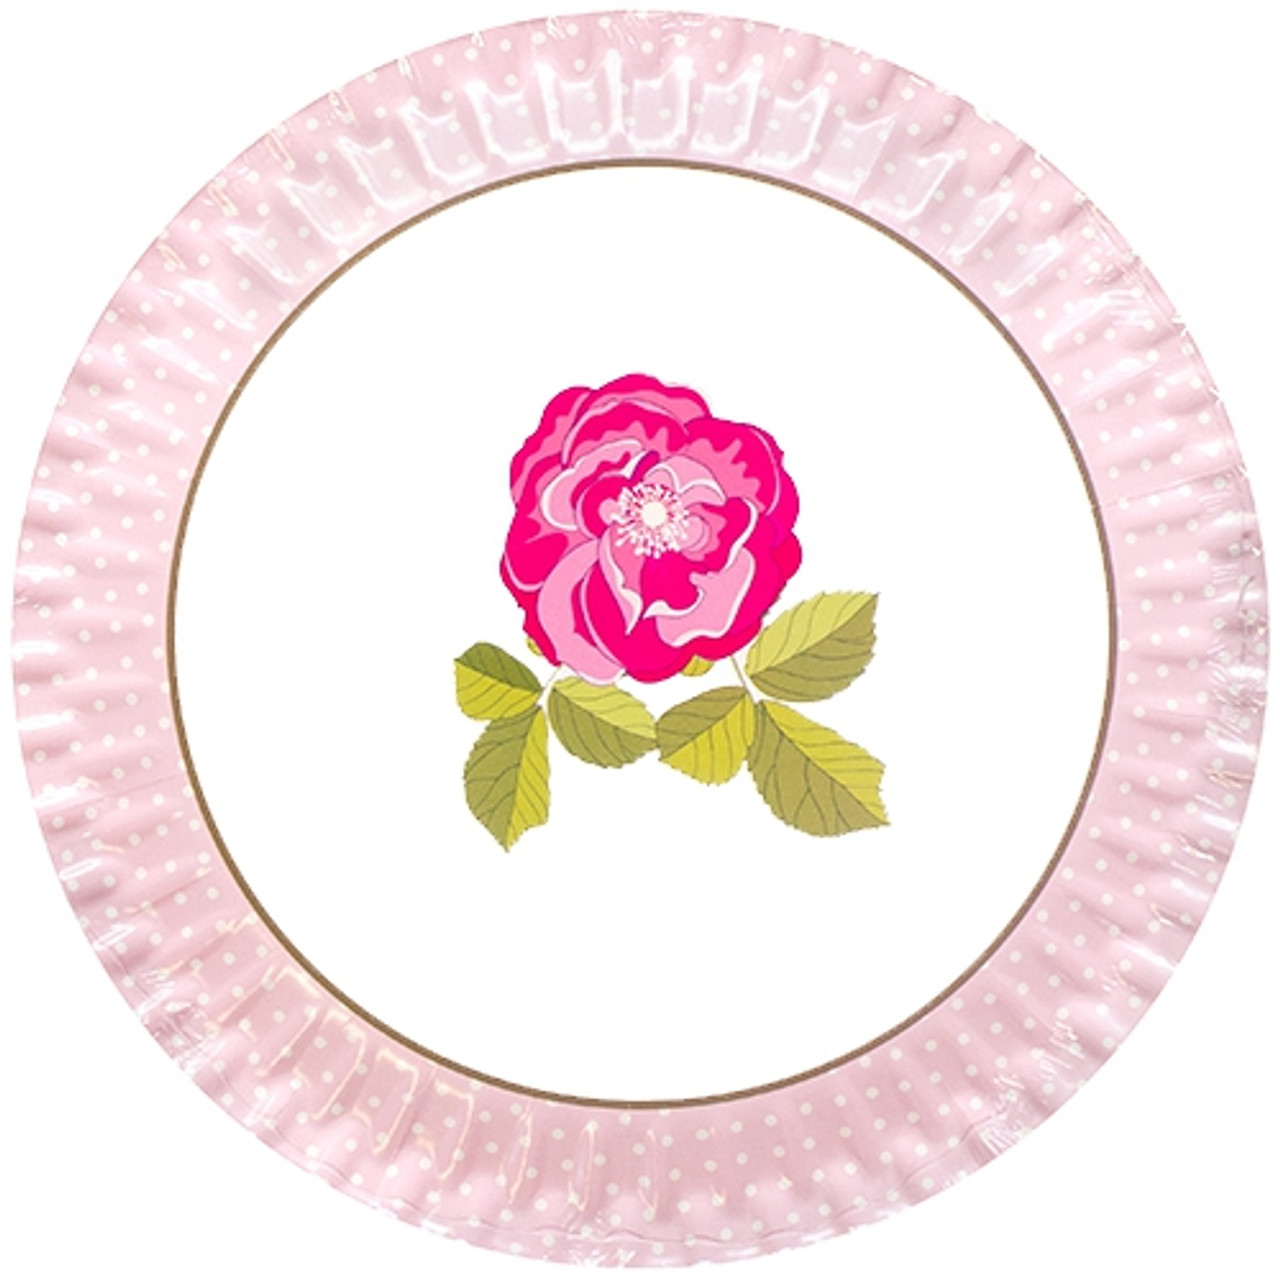 Wedding - Wedding Themes - Vintage Rose Wedding Theme - Page 1 ...